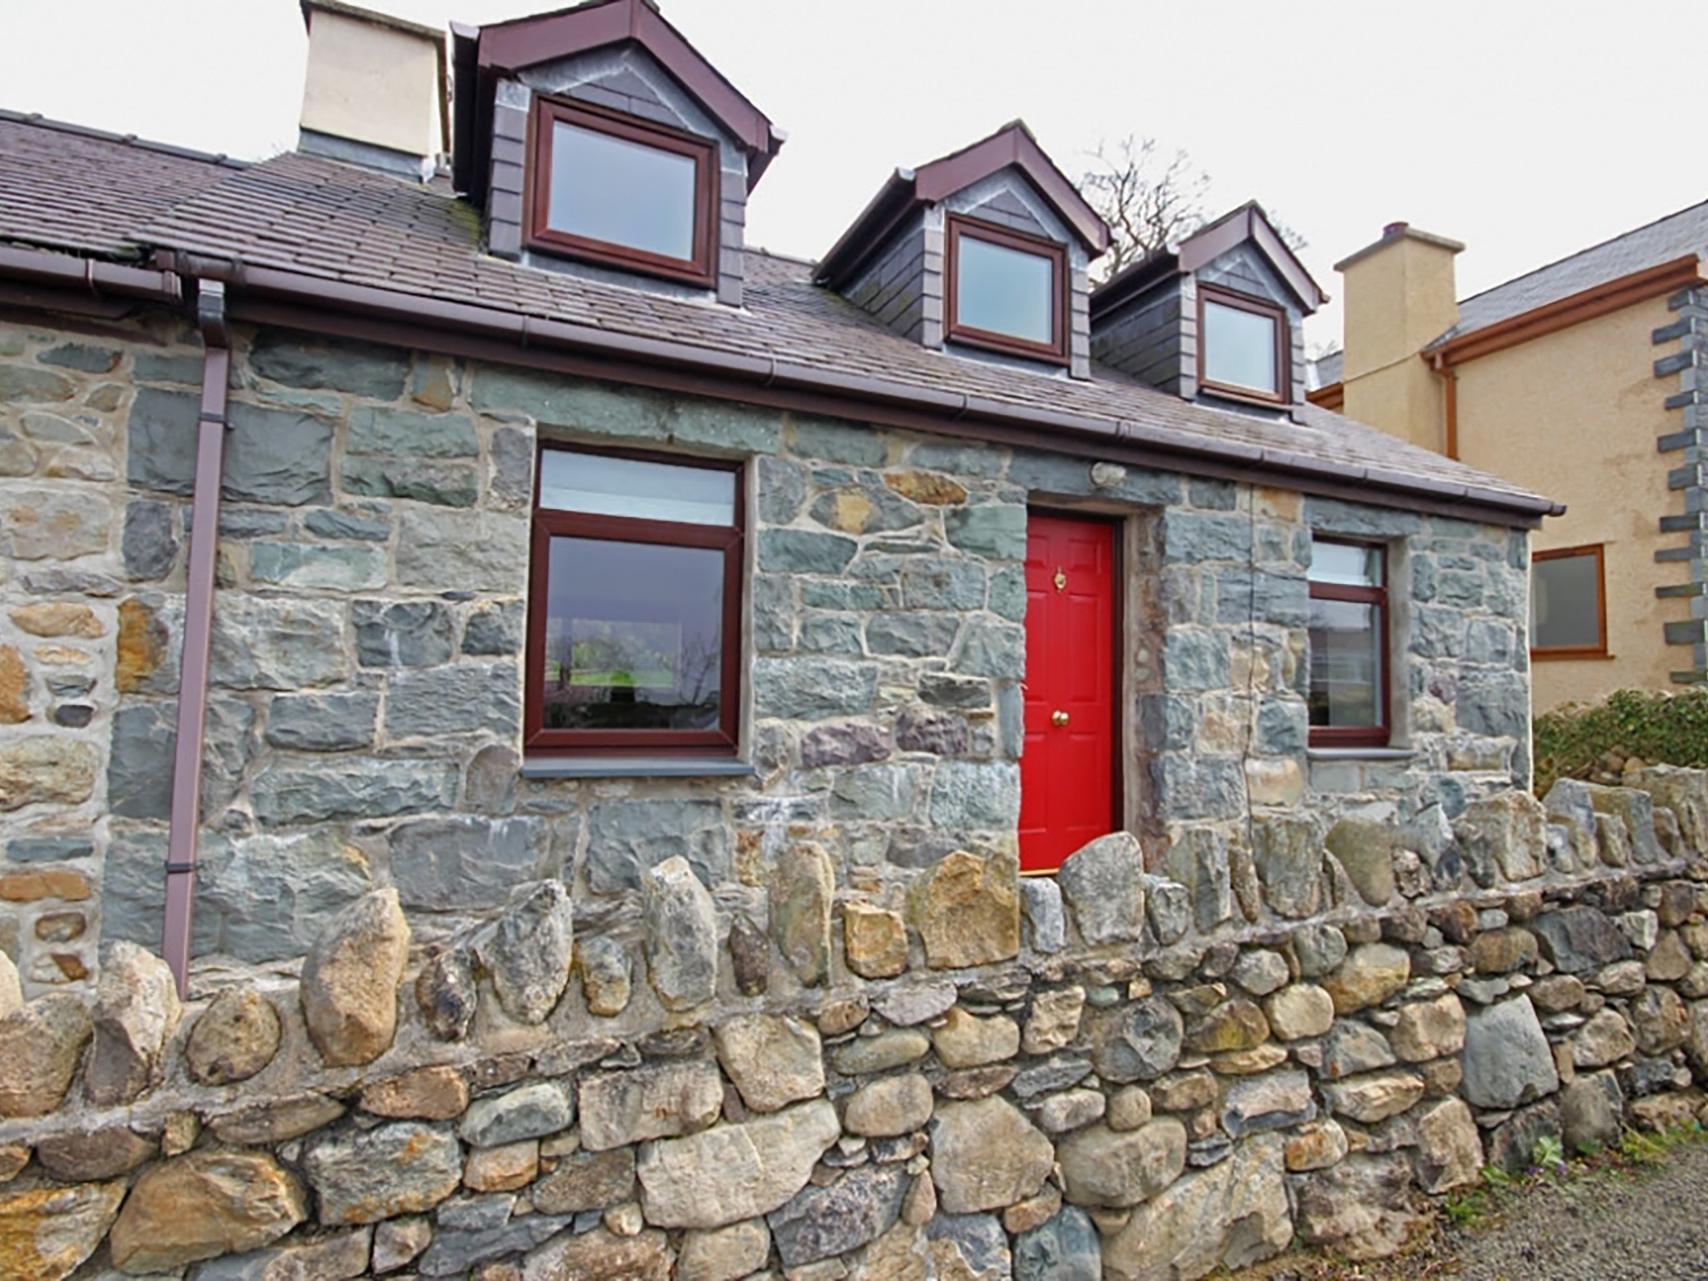 Holiday Cottage Reviews for Wernas - Holiday Cottage in Porthmadog, Gwynedd